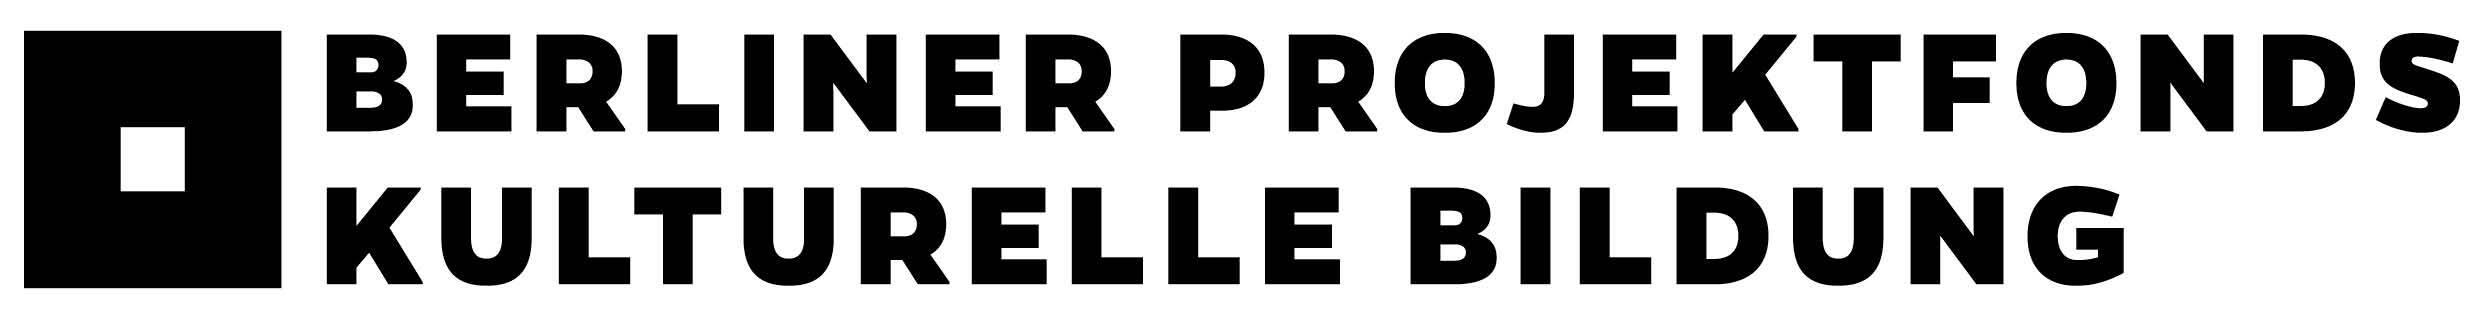 LOGO_Projektfonds-Kulturelle-Bildung